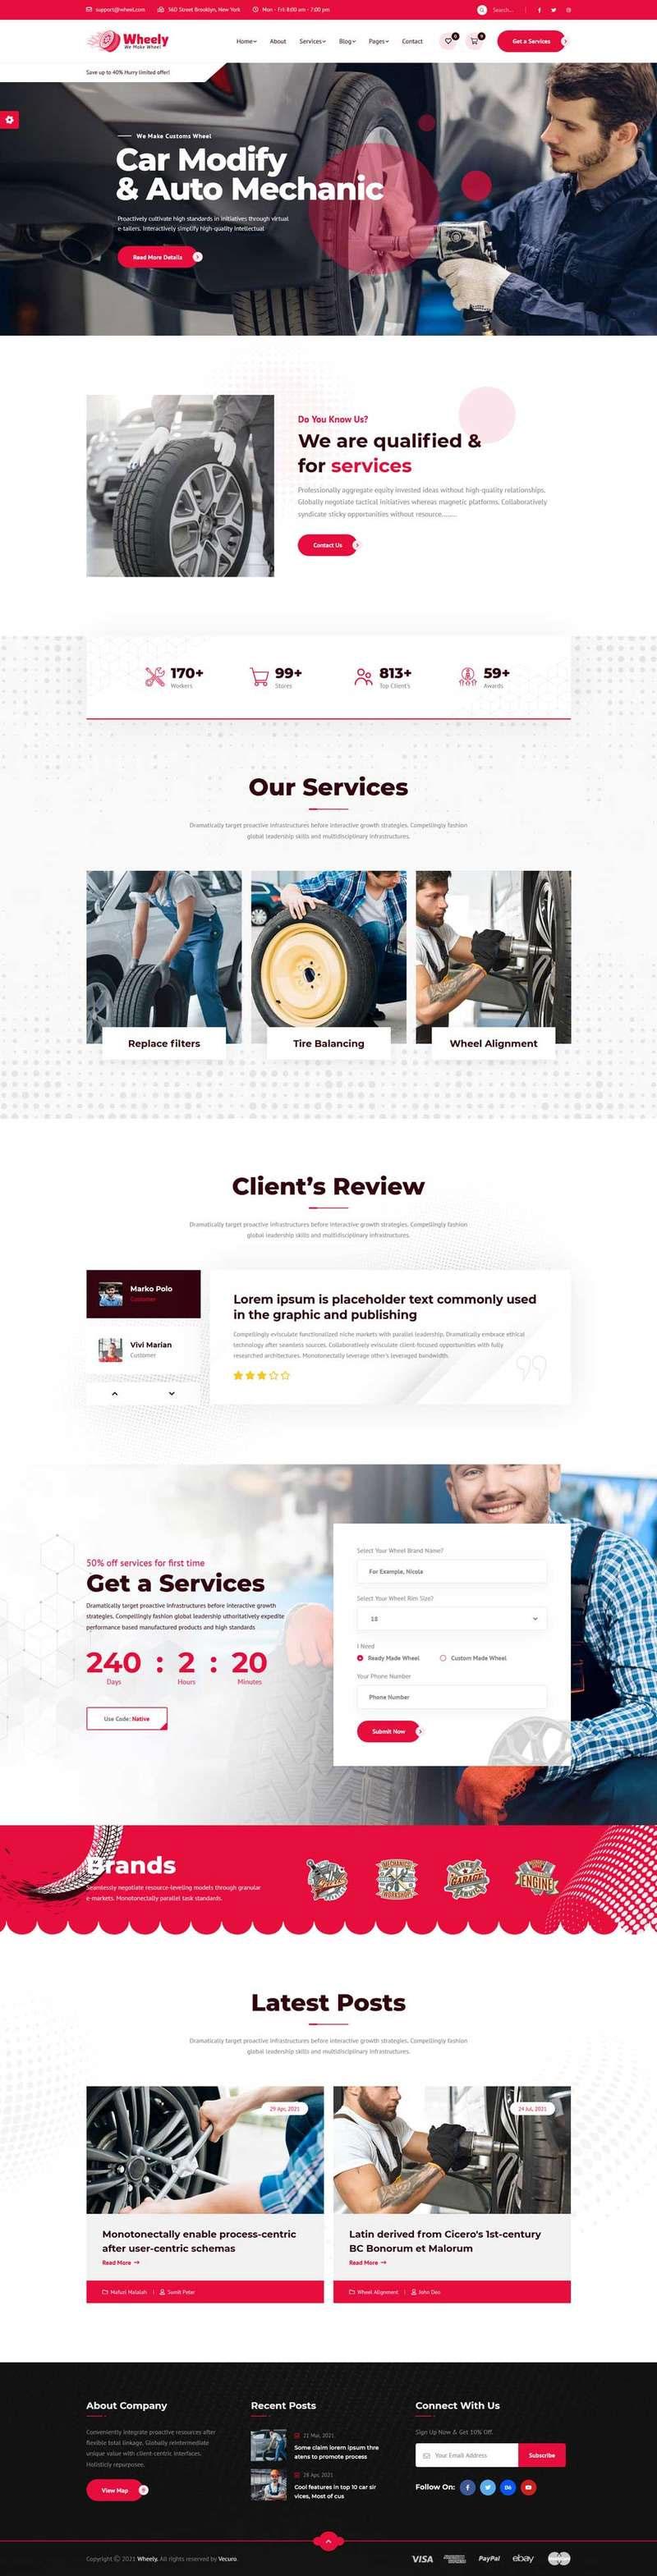 html5红色大气品牌汽车轮胎和维修公司网站模板